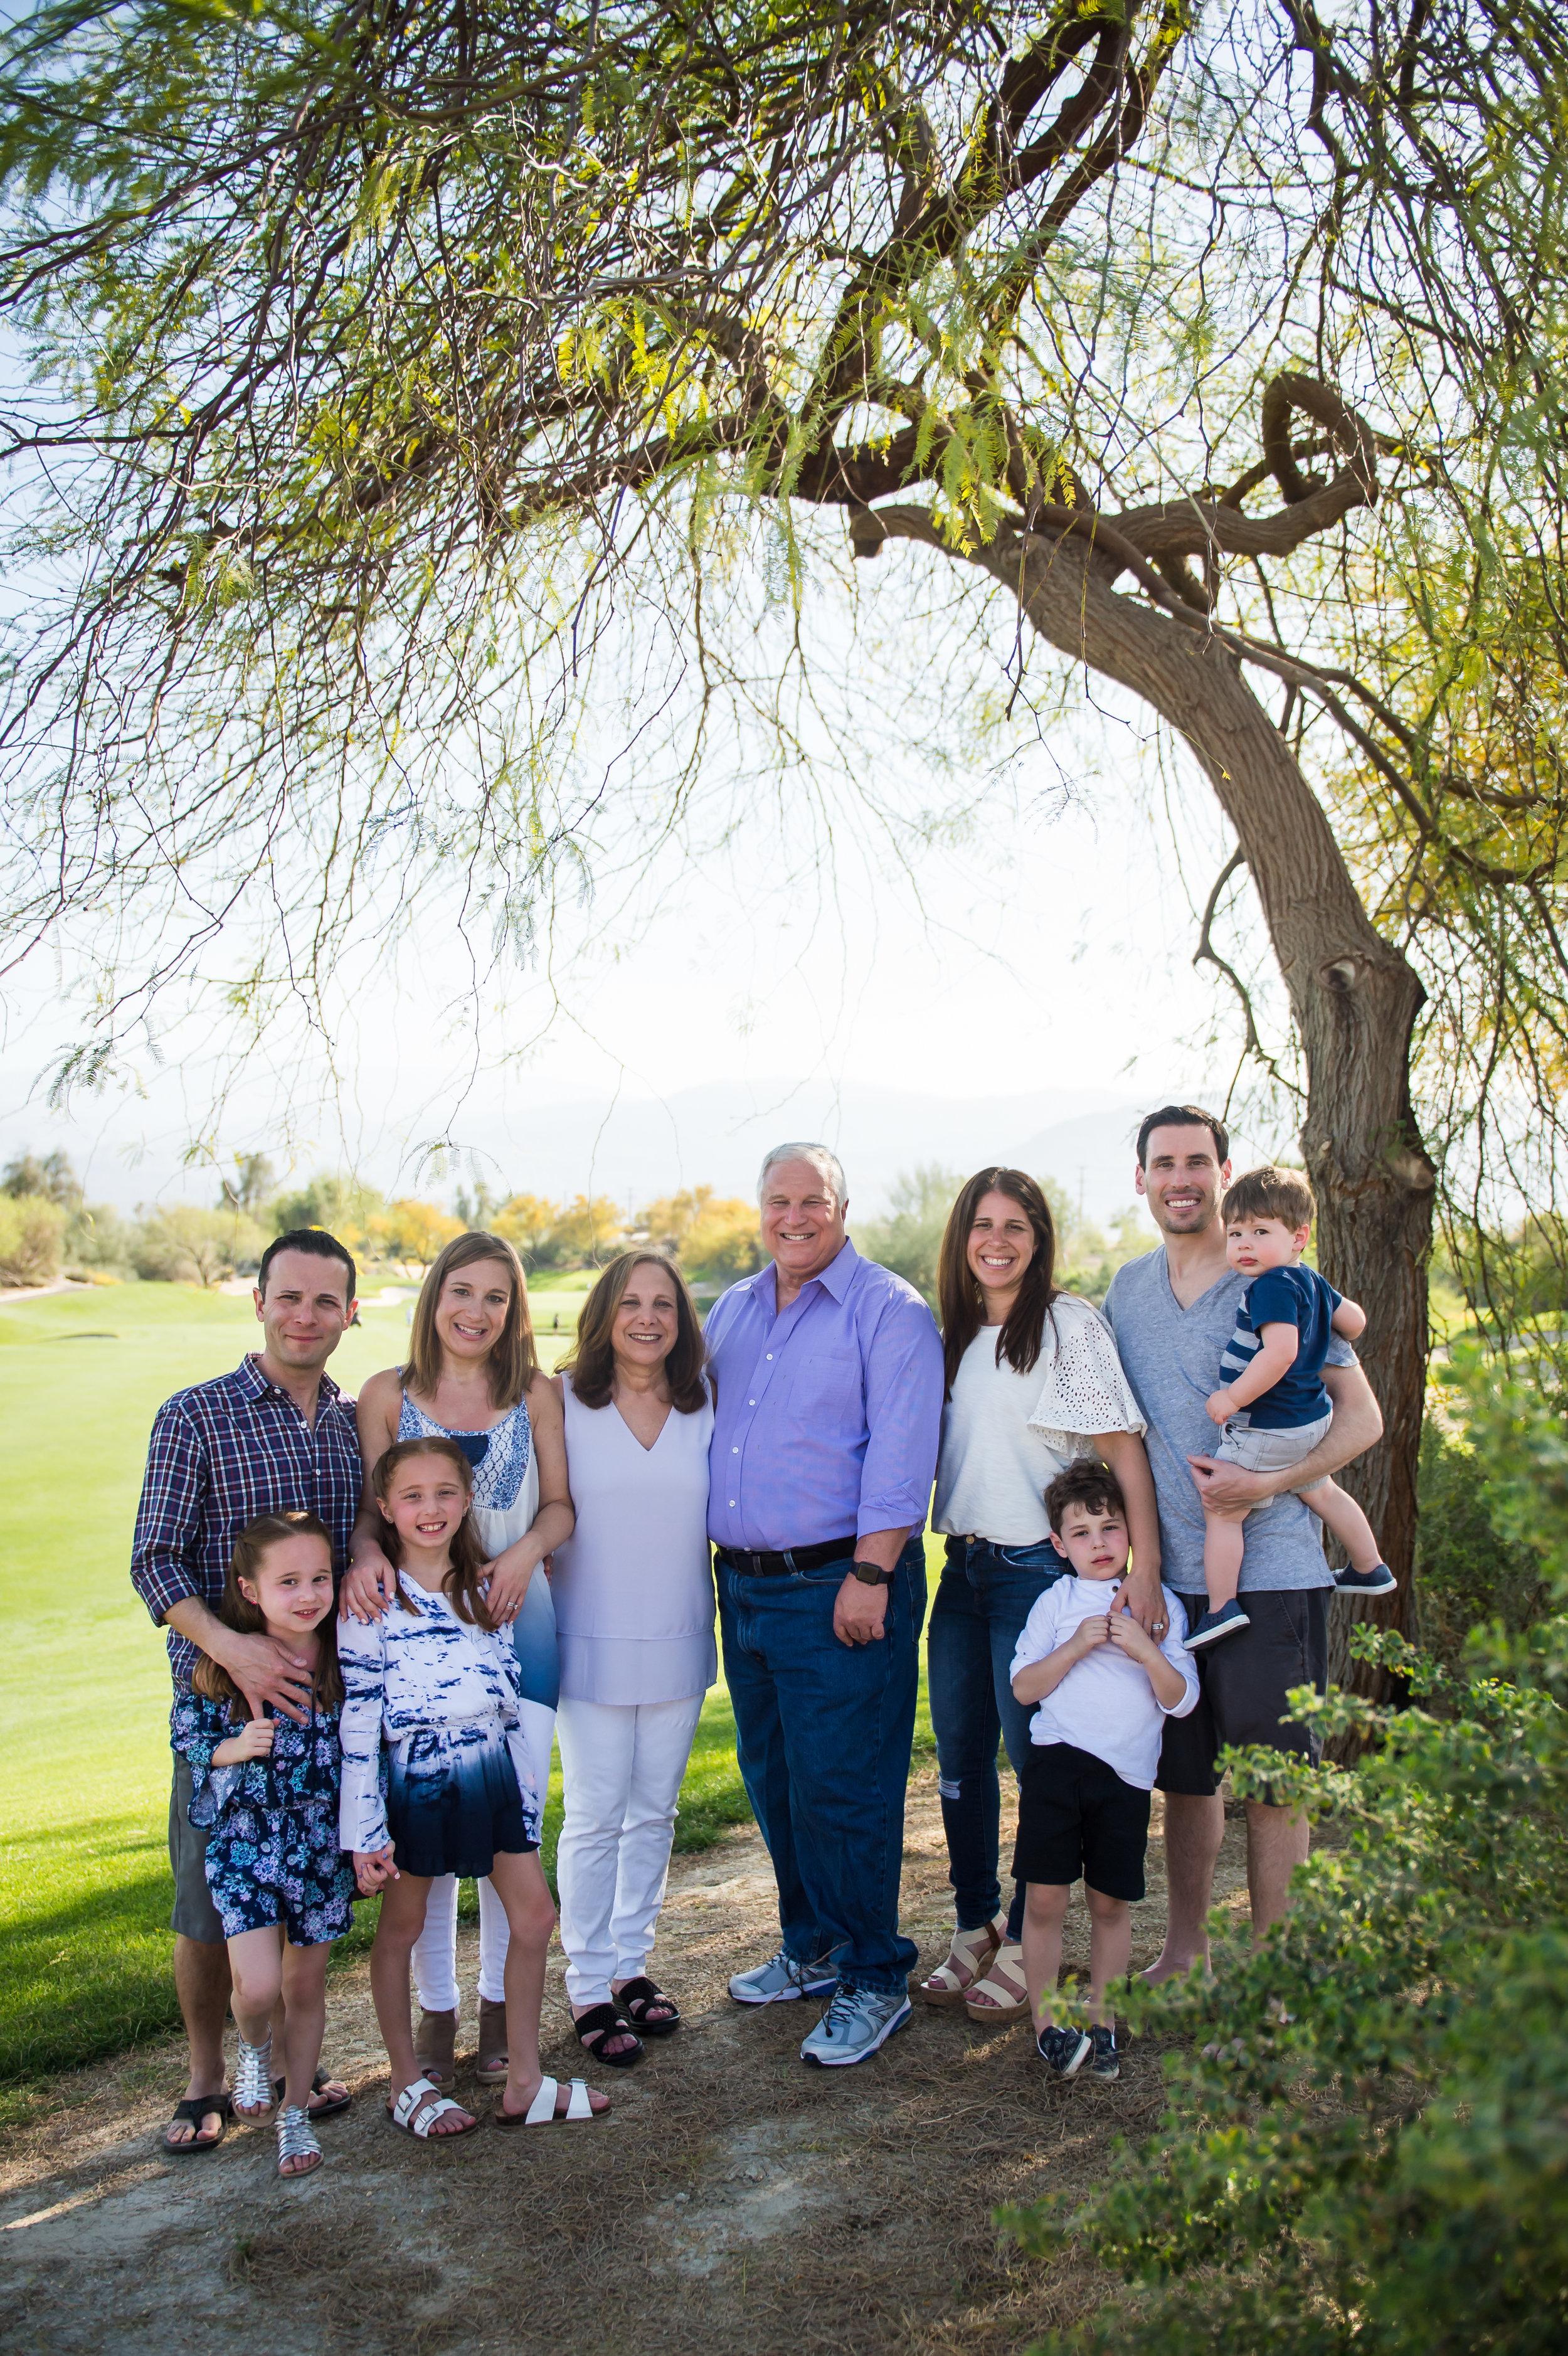 2westinpalmdesertphotographerfamilypictures.jpg